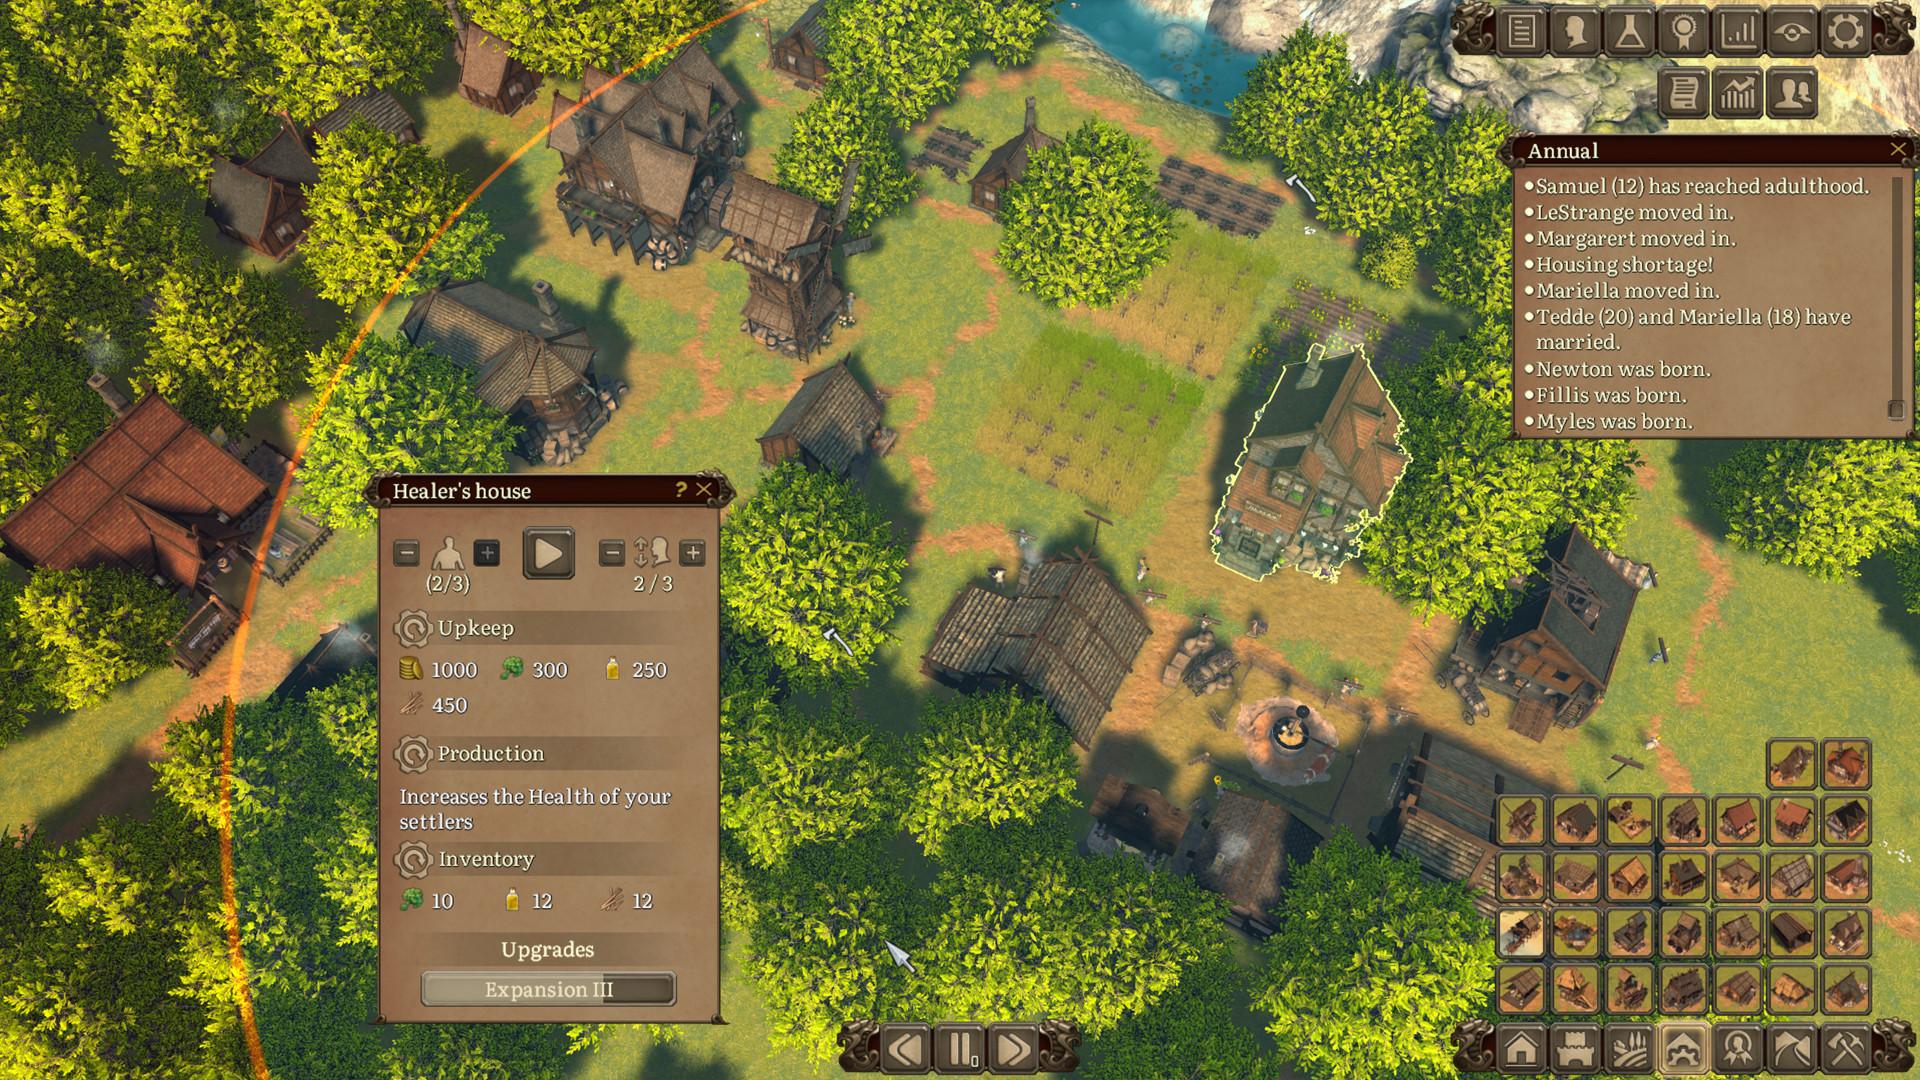 patron-pc-screenshot-1